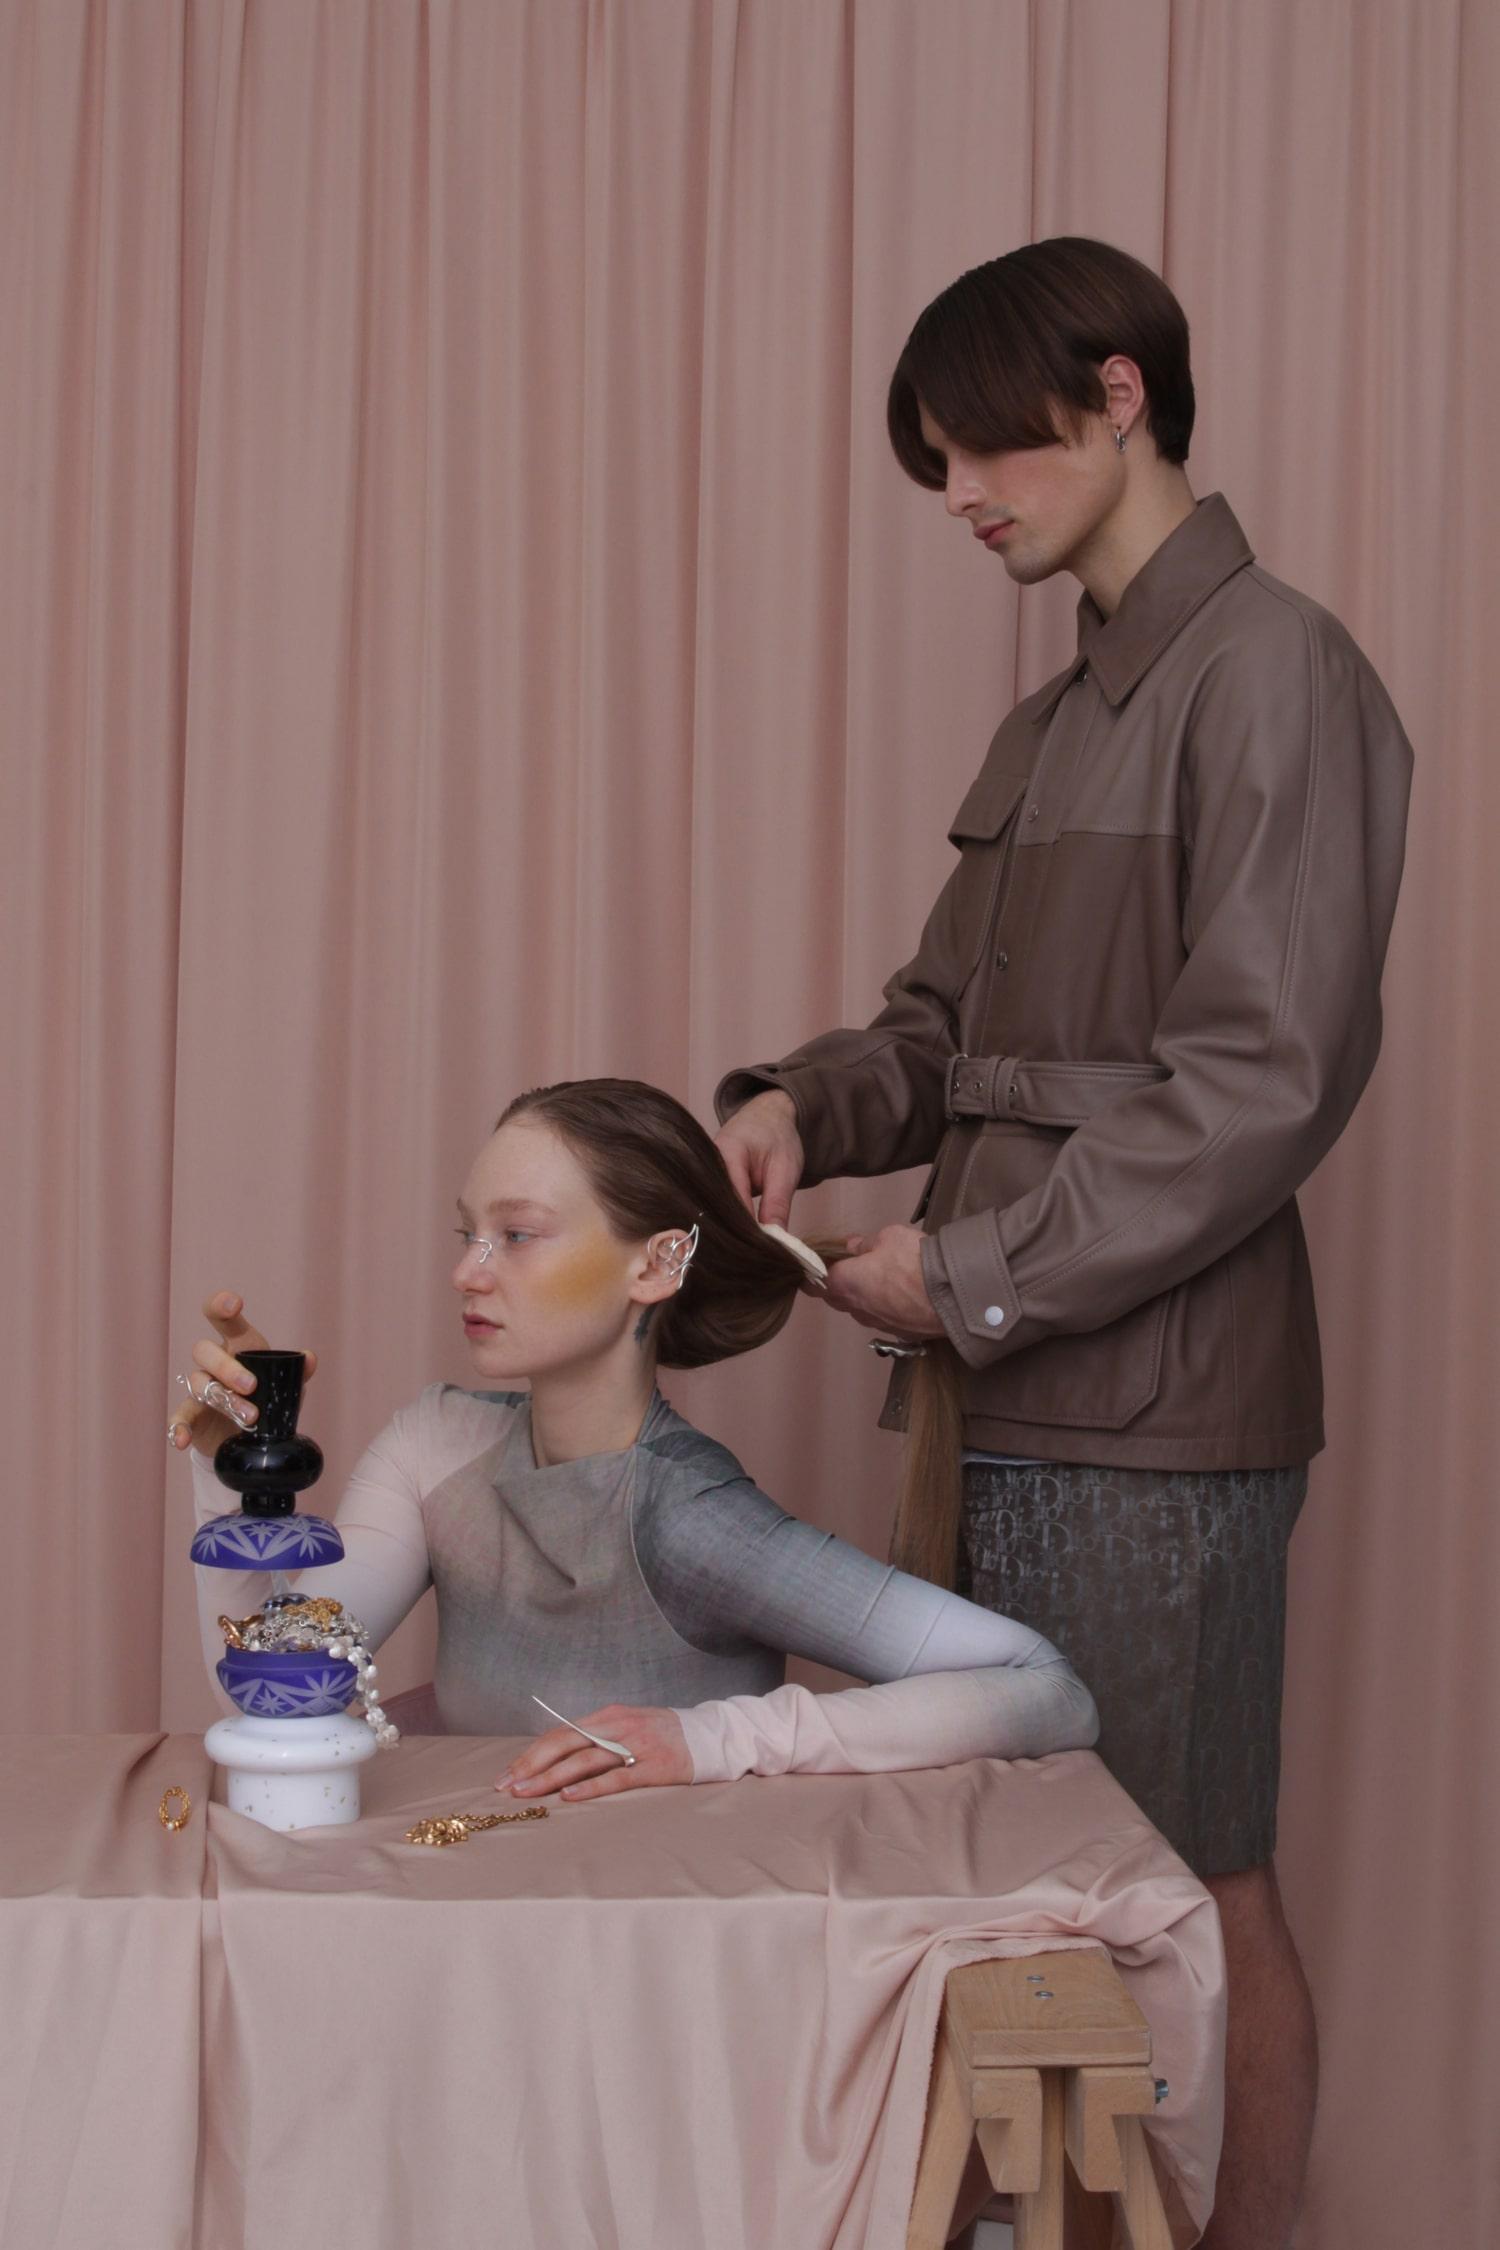 taja-spasskova-dolce-vita-magazine-artist-fashion-editorial-fashion-photography